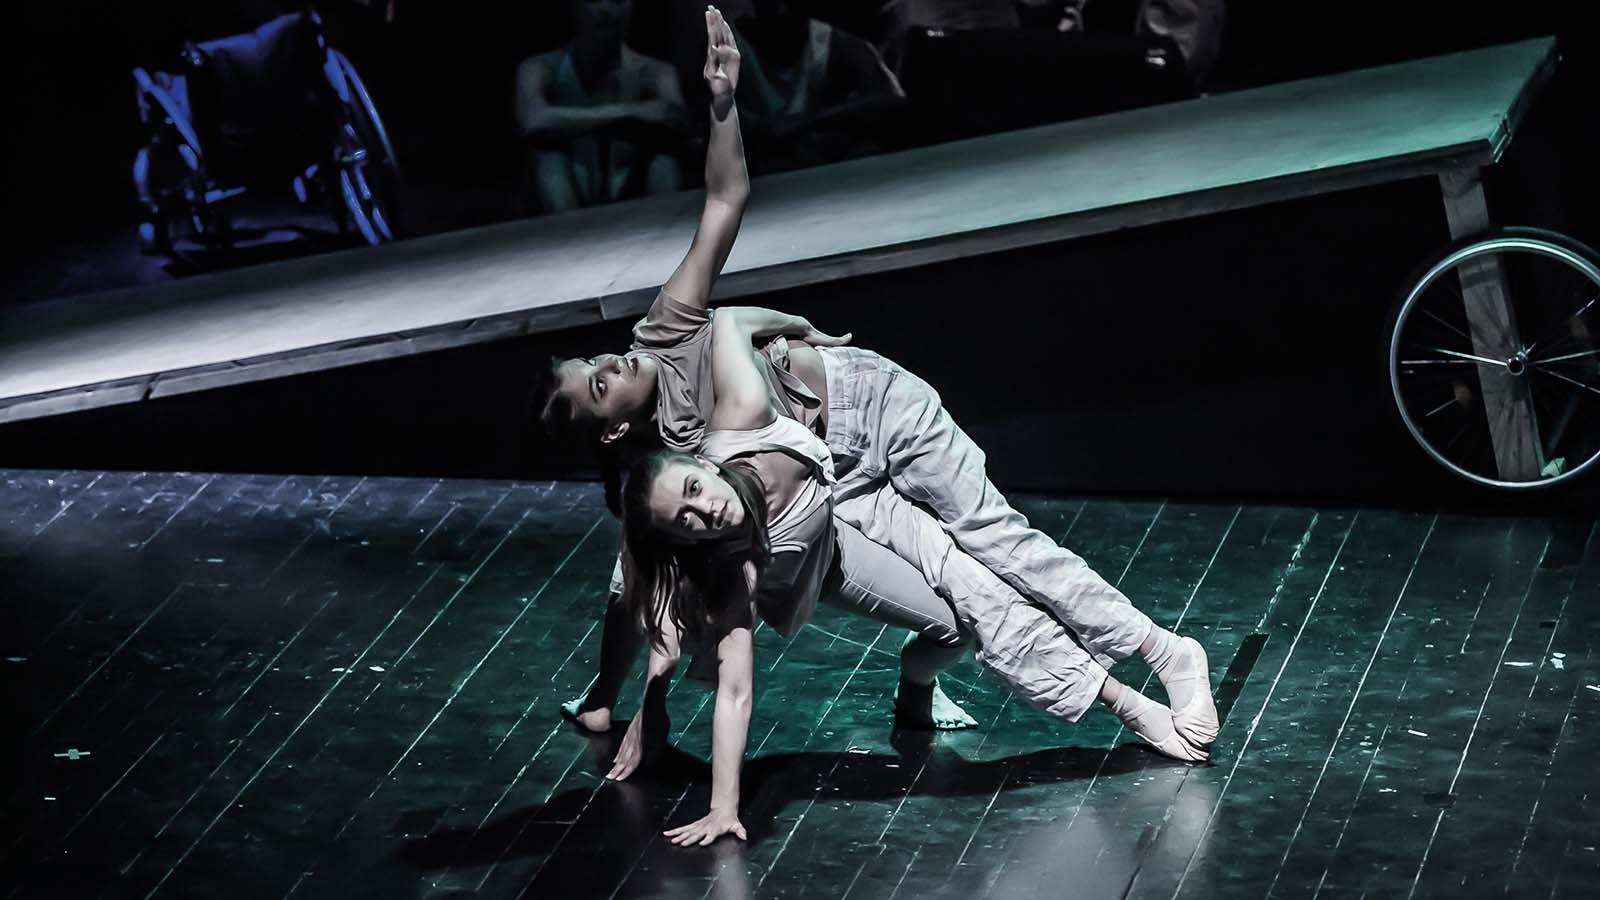 L-Performance / Foto: Yilmaz Ulus